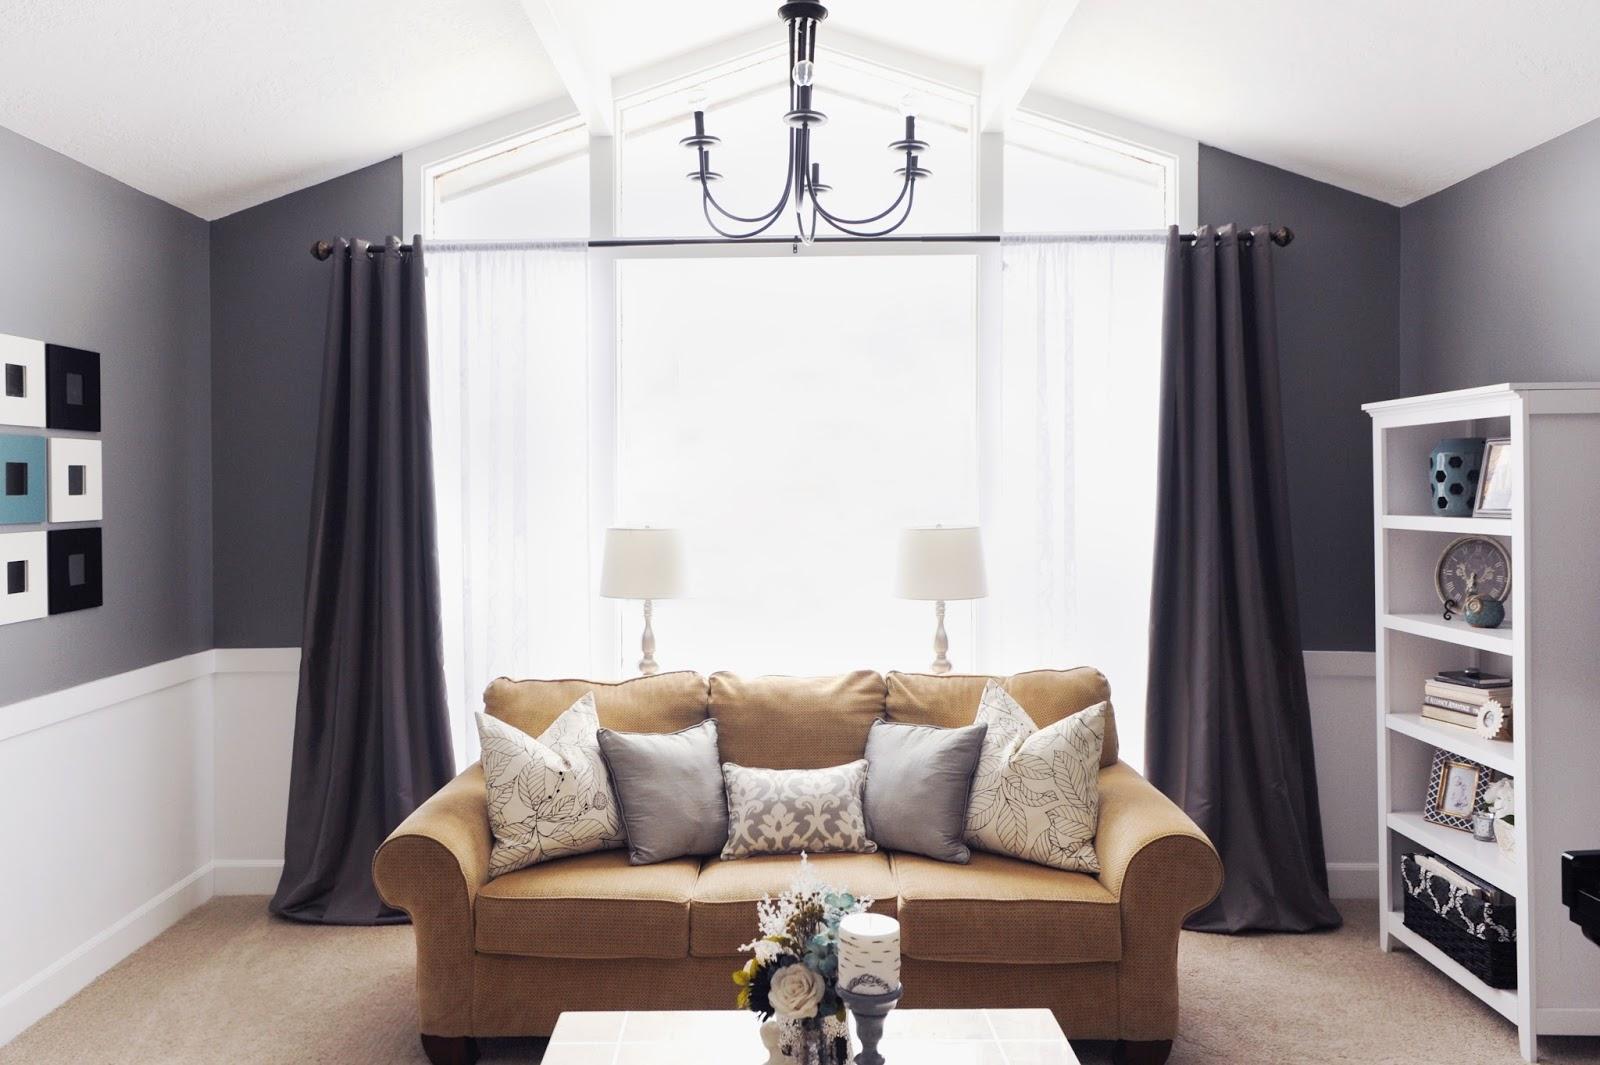 Studio 7 Interior Design: The Friday Five: Curtain Panels